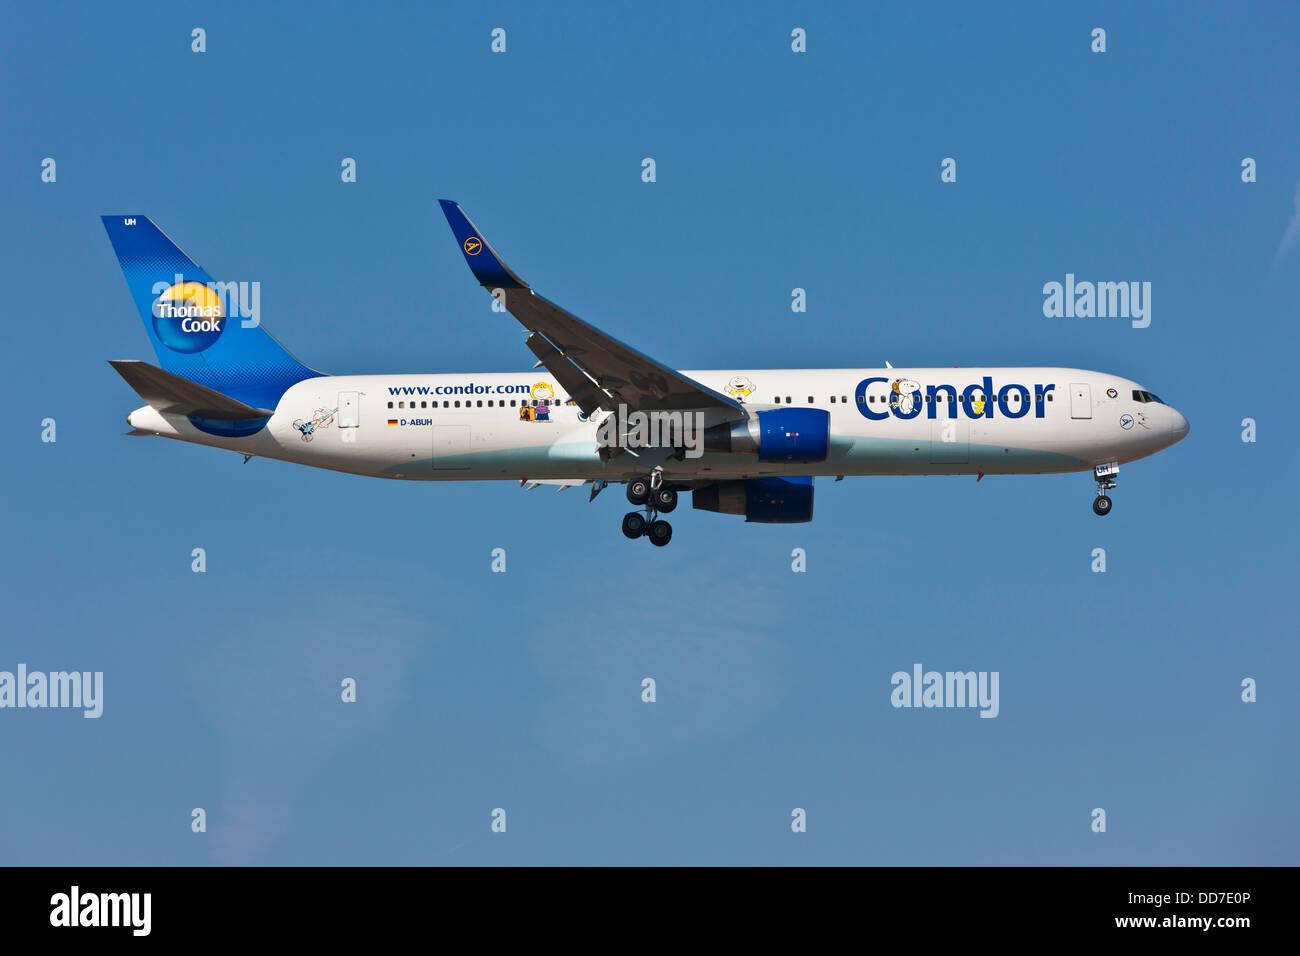 Germany, Hesse, Aeroplane landing at airport - Stock Image